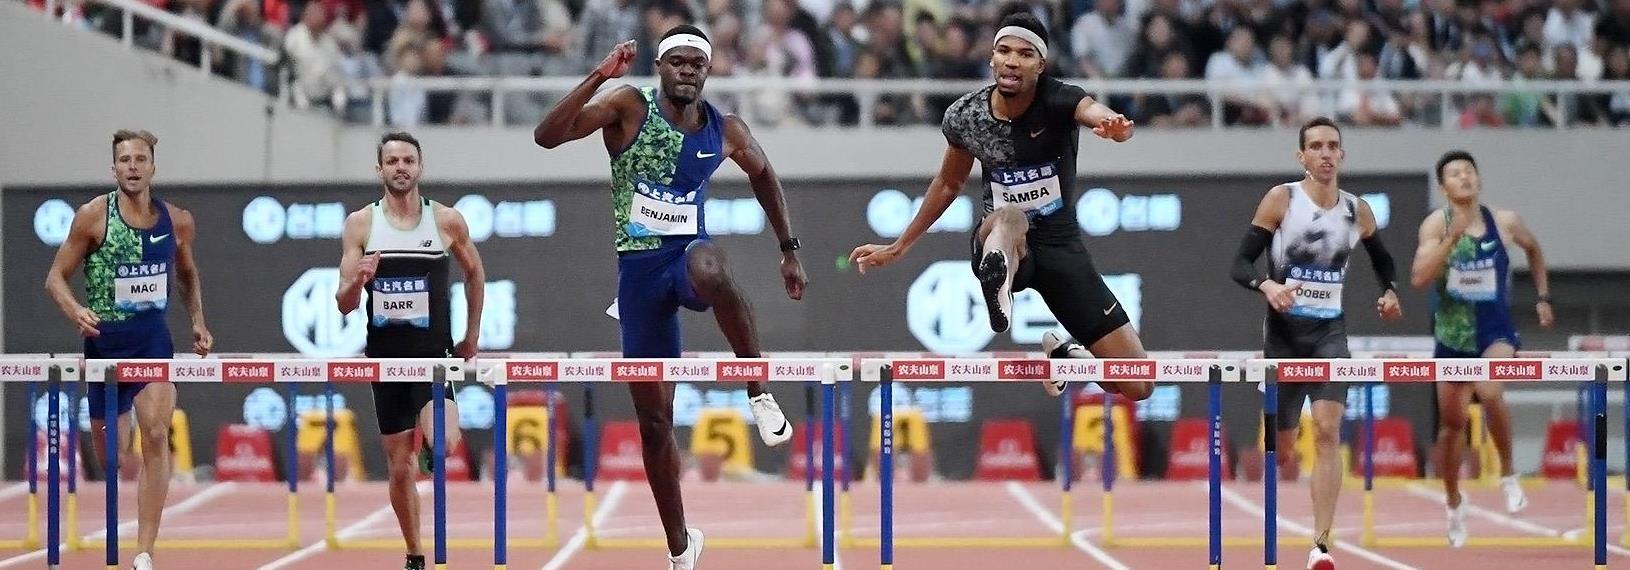 Abderrahman Samba leads Rai Benjamin in the 400m hurdles at the IAAF Diamond League meeting in Shanghai (Errol Anderson)